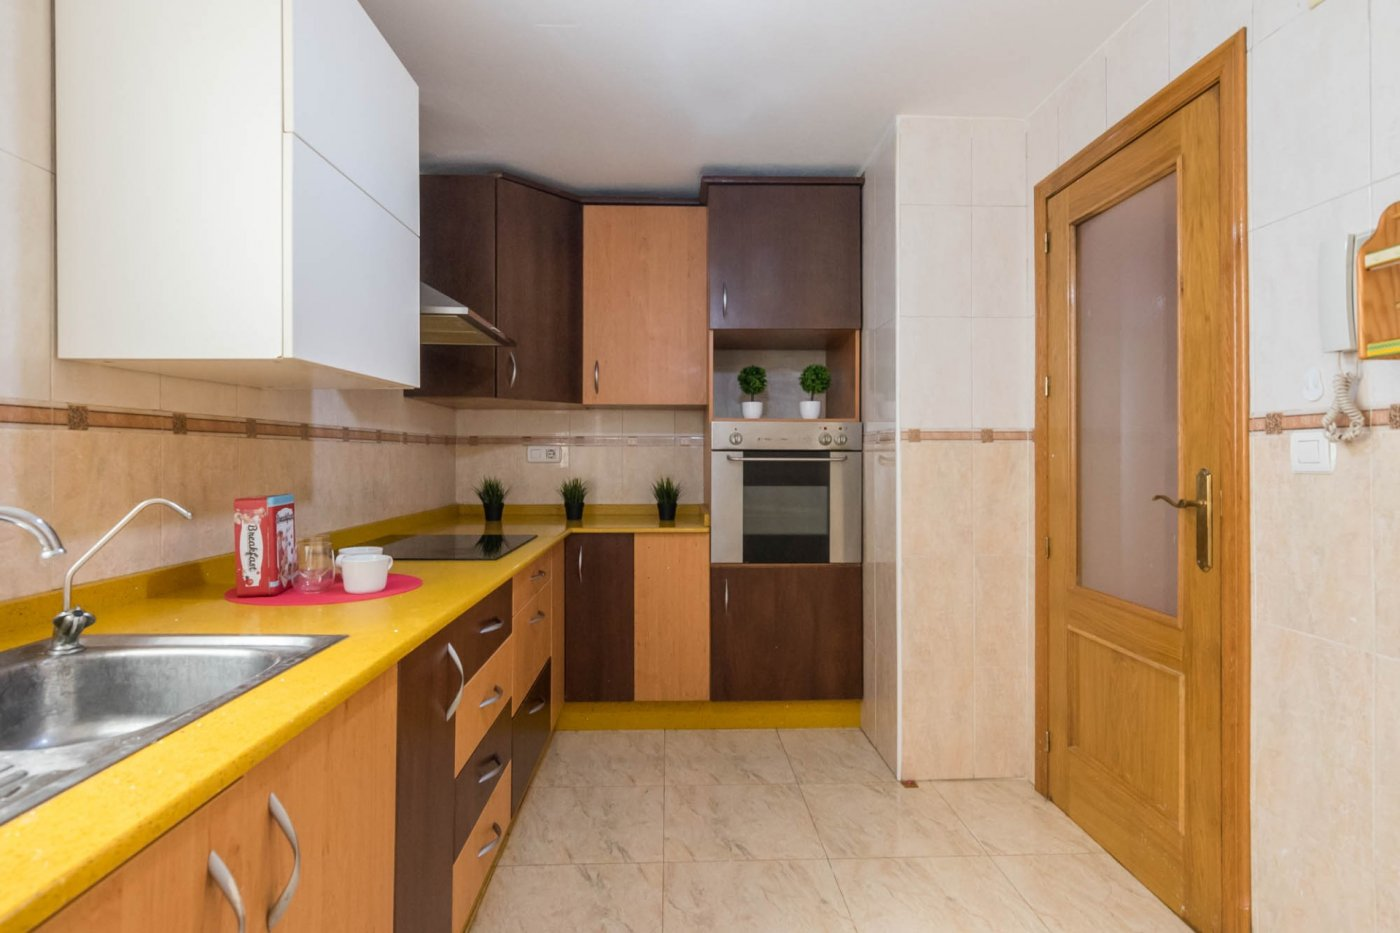 Apartamento · Murcia · Barrio Del Progreso 89.900€€